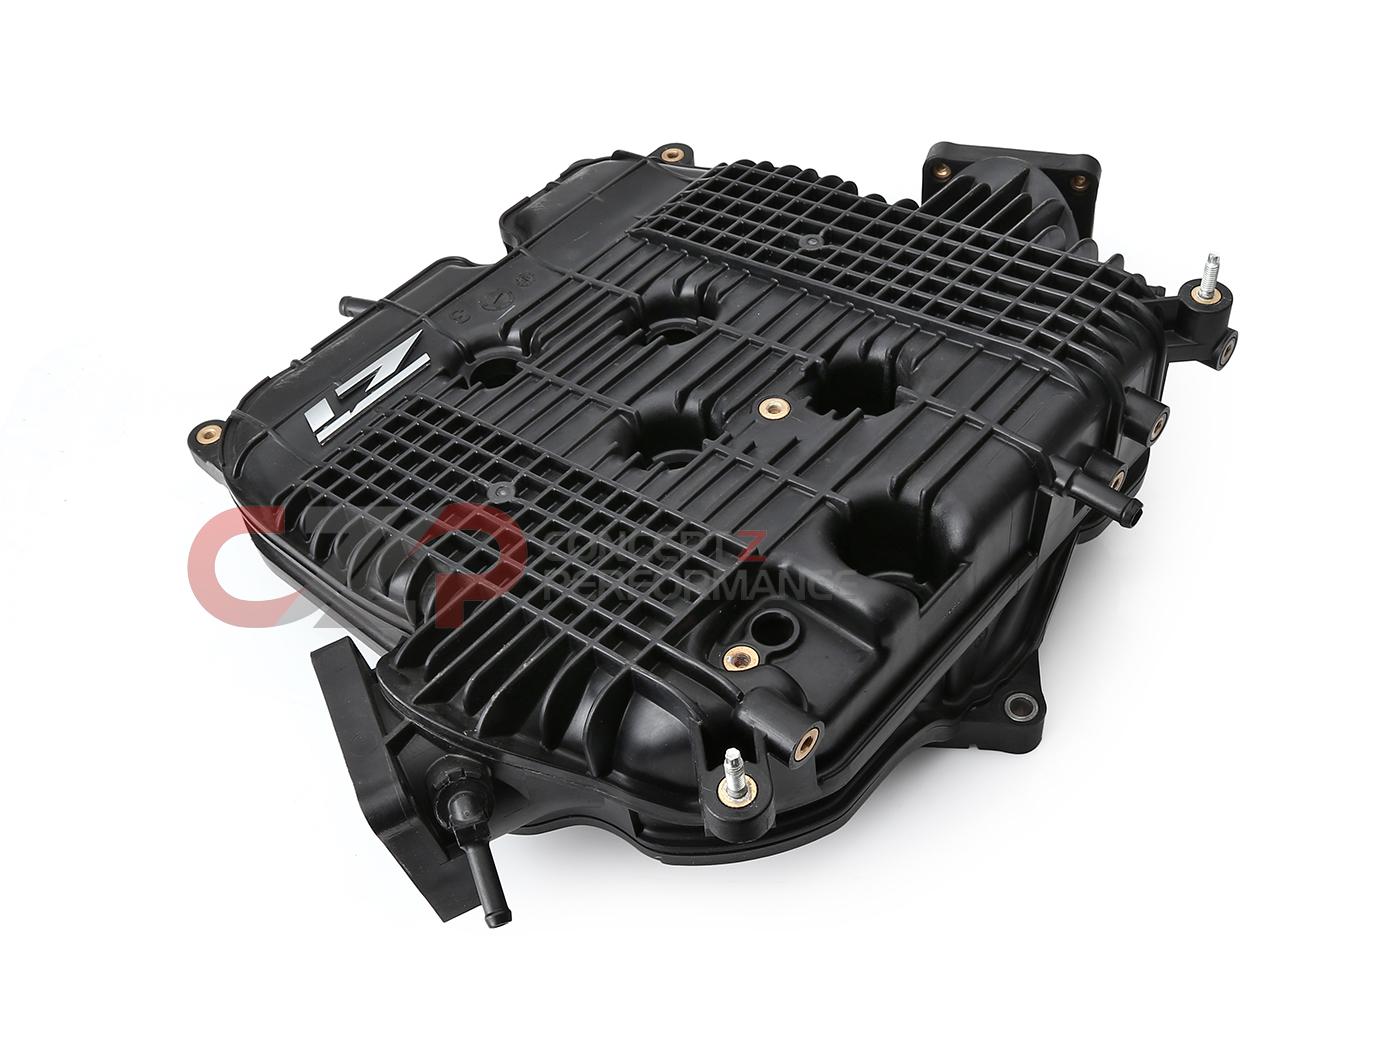 Z1 Motorsports Intake Plenum Power Mod - Nissan 370Z VQ37VHR Z34  Z1-14010-PRTD - Concept Z Performance